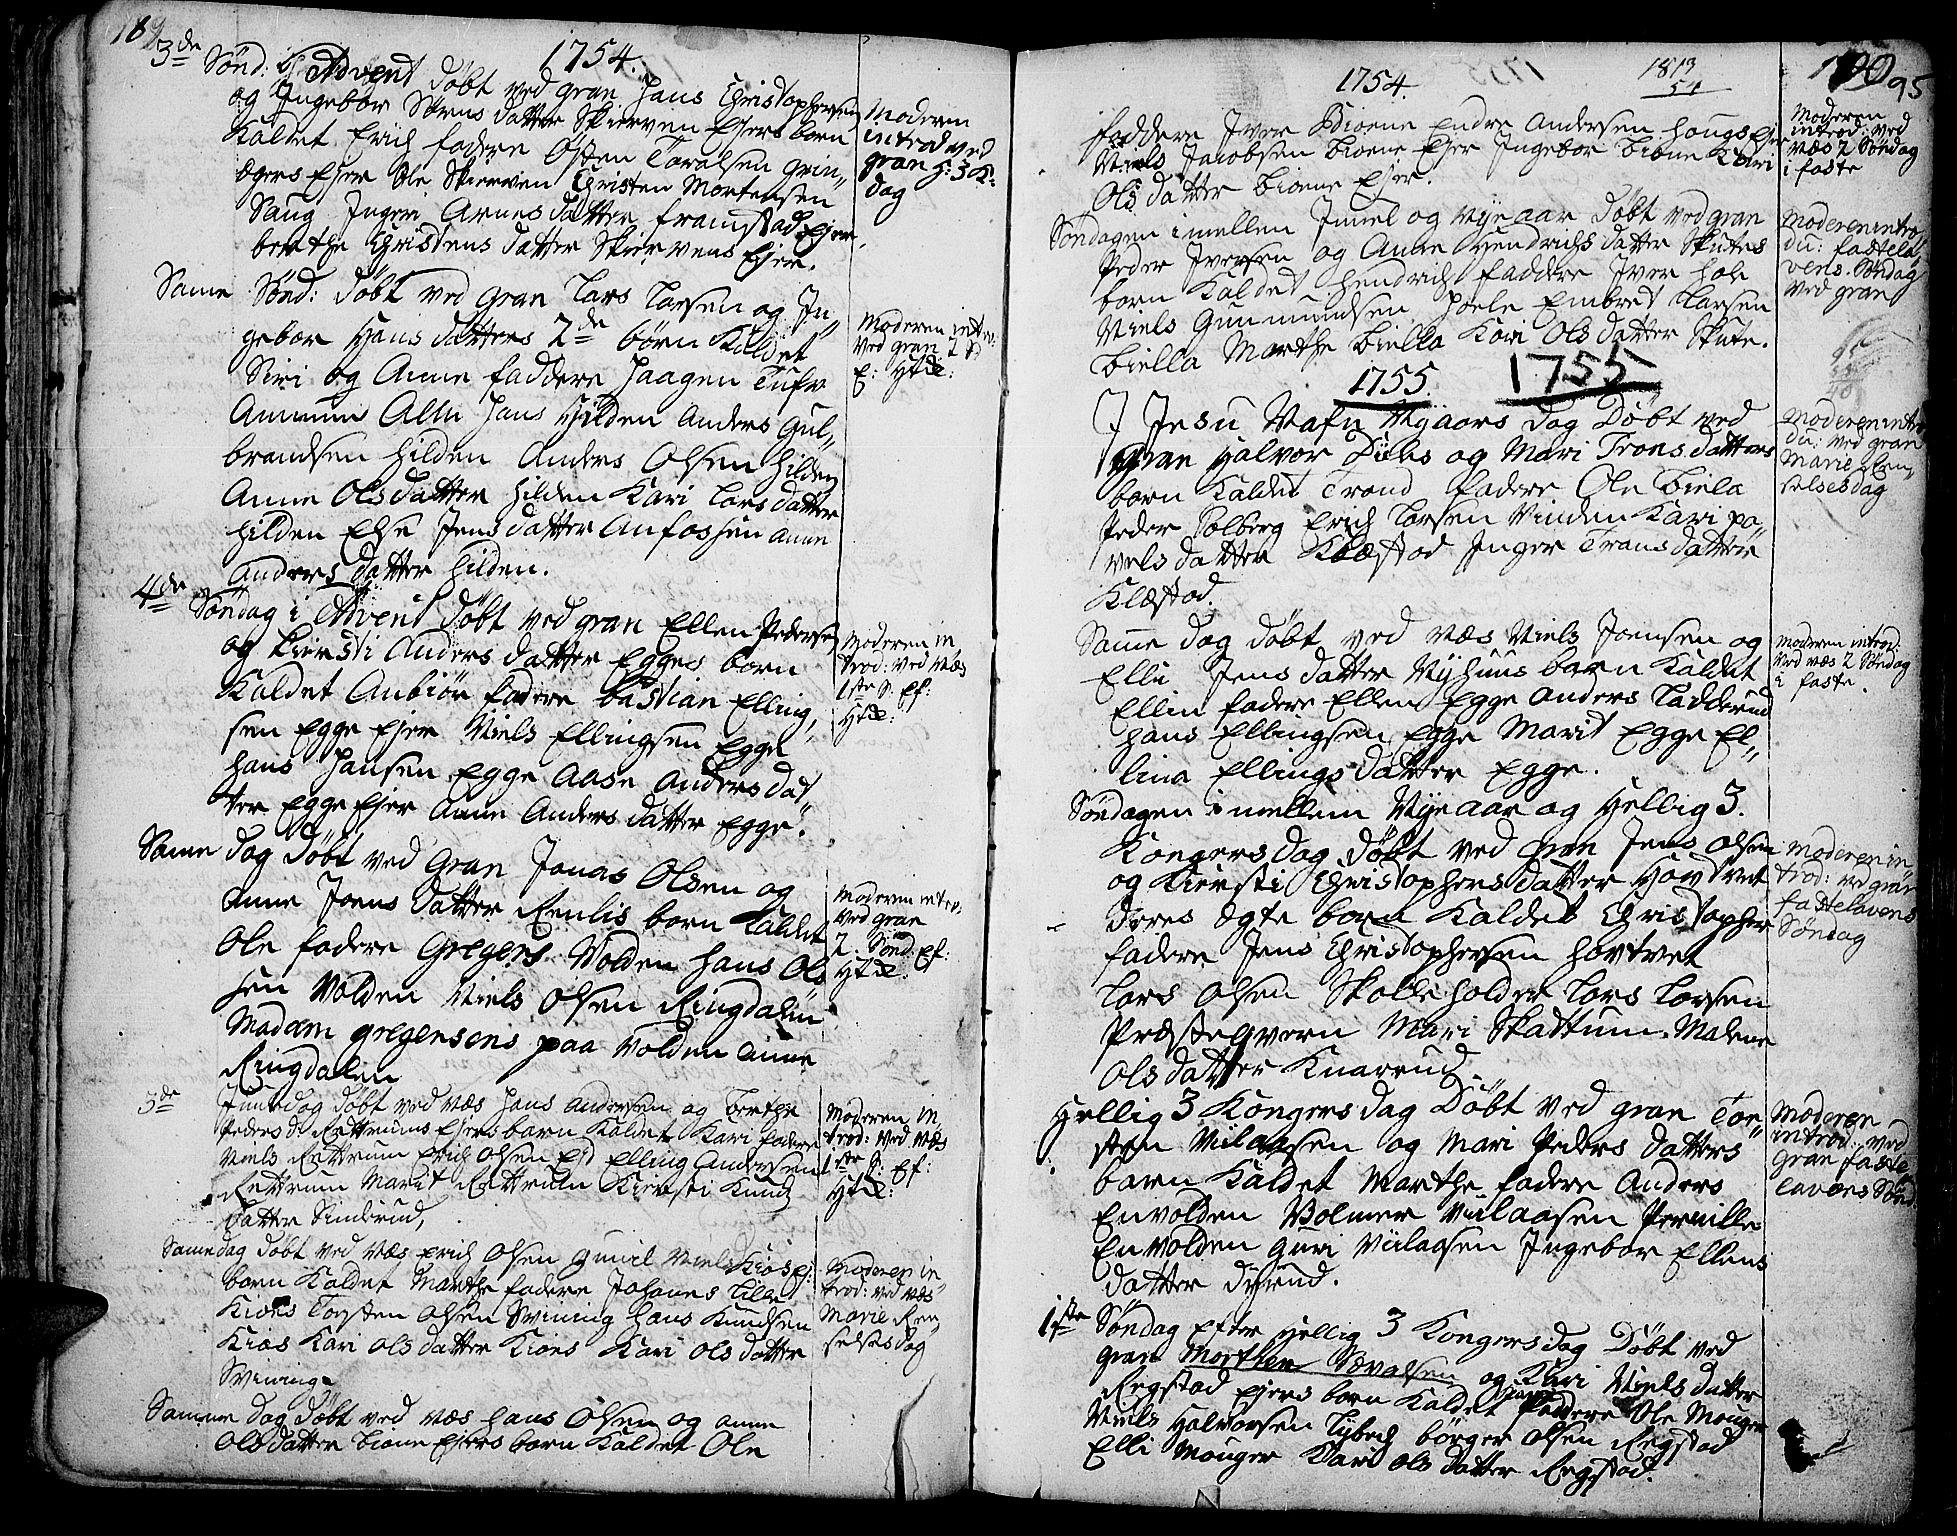 SAH, Gran prestekontor, Ministerialbok nr. 3, 1745-1758, s. 95